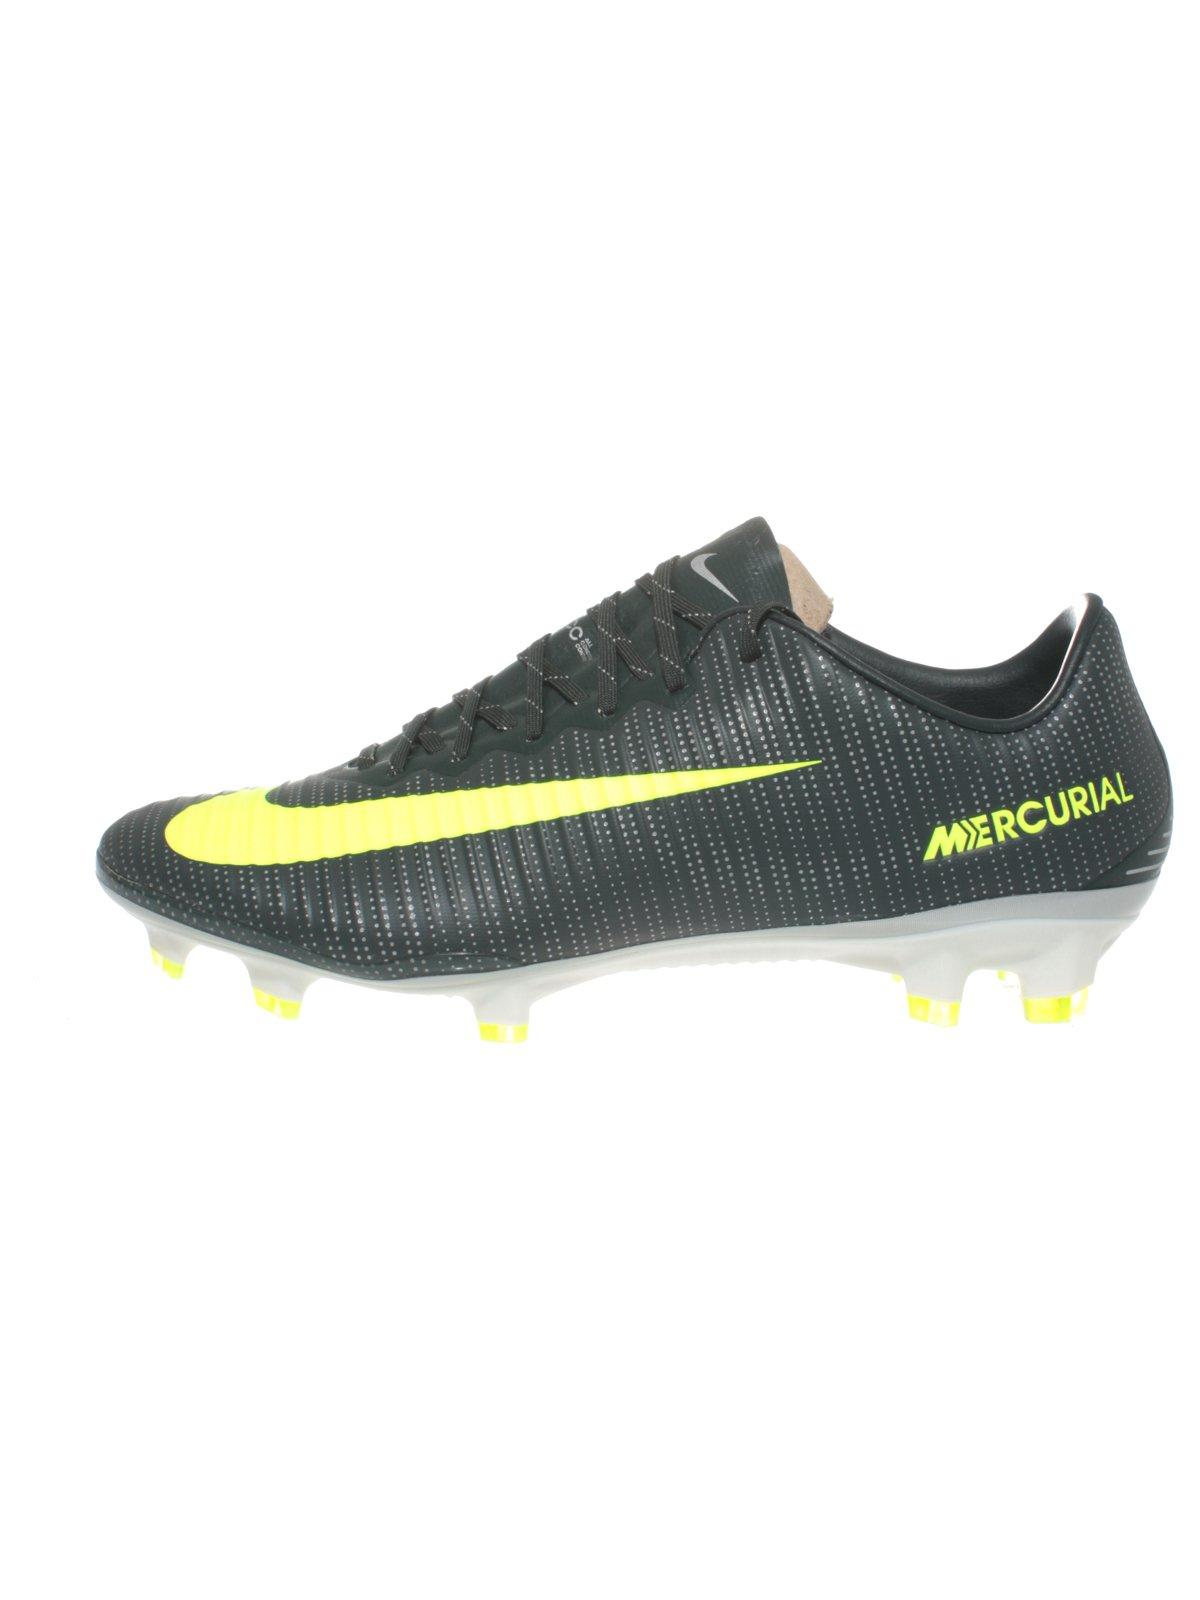 Nike Men's Mercurial Vapor XI CR7 FG Soccer Cleat (Sz. 11) Purple Dynasty, Bright Citrus